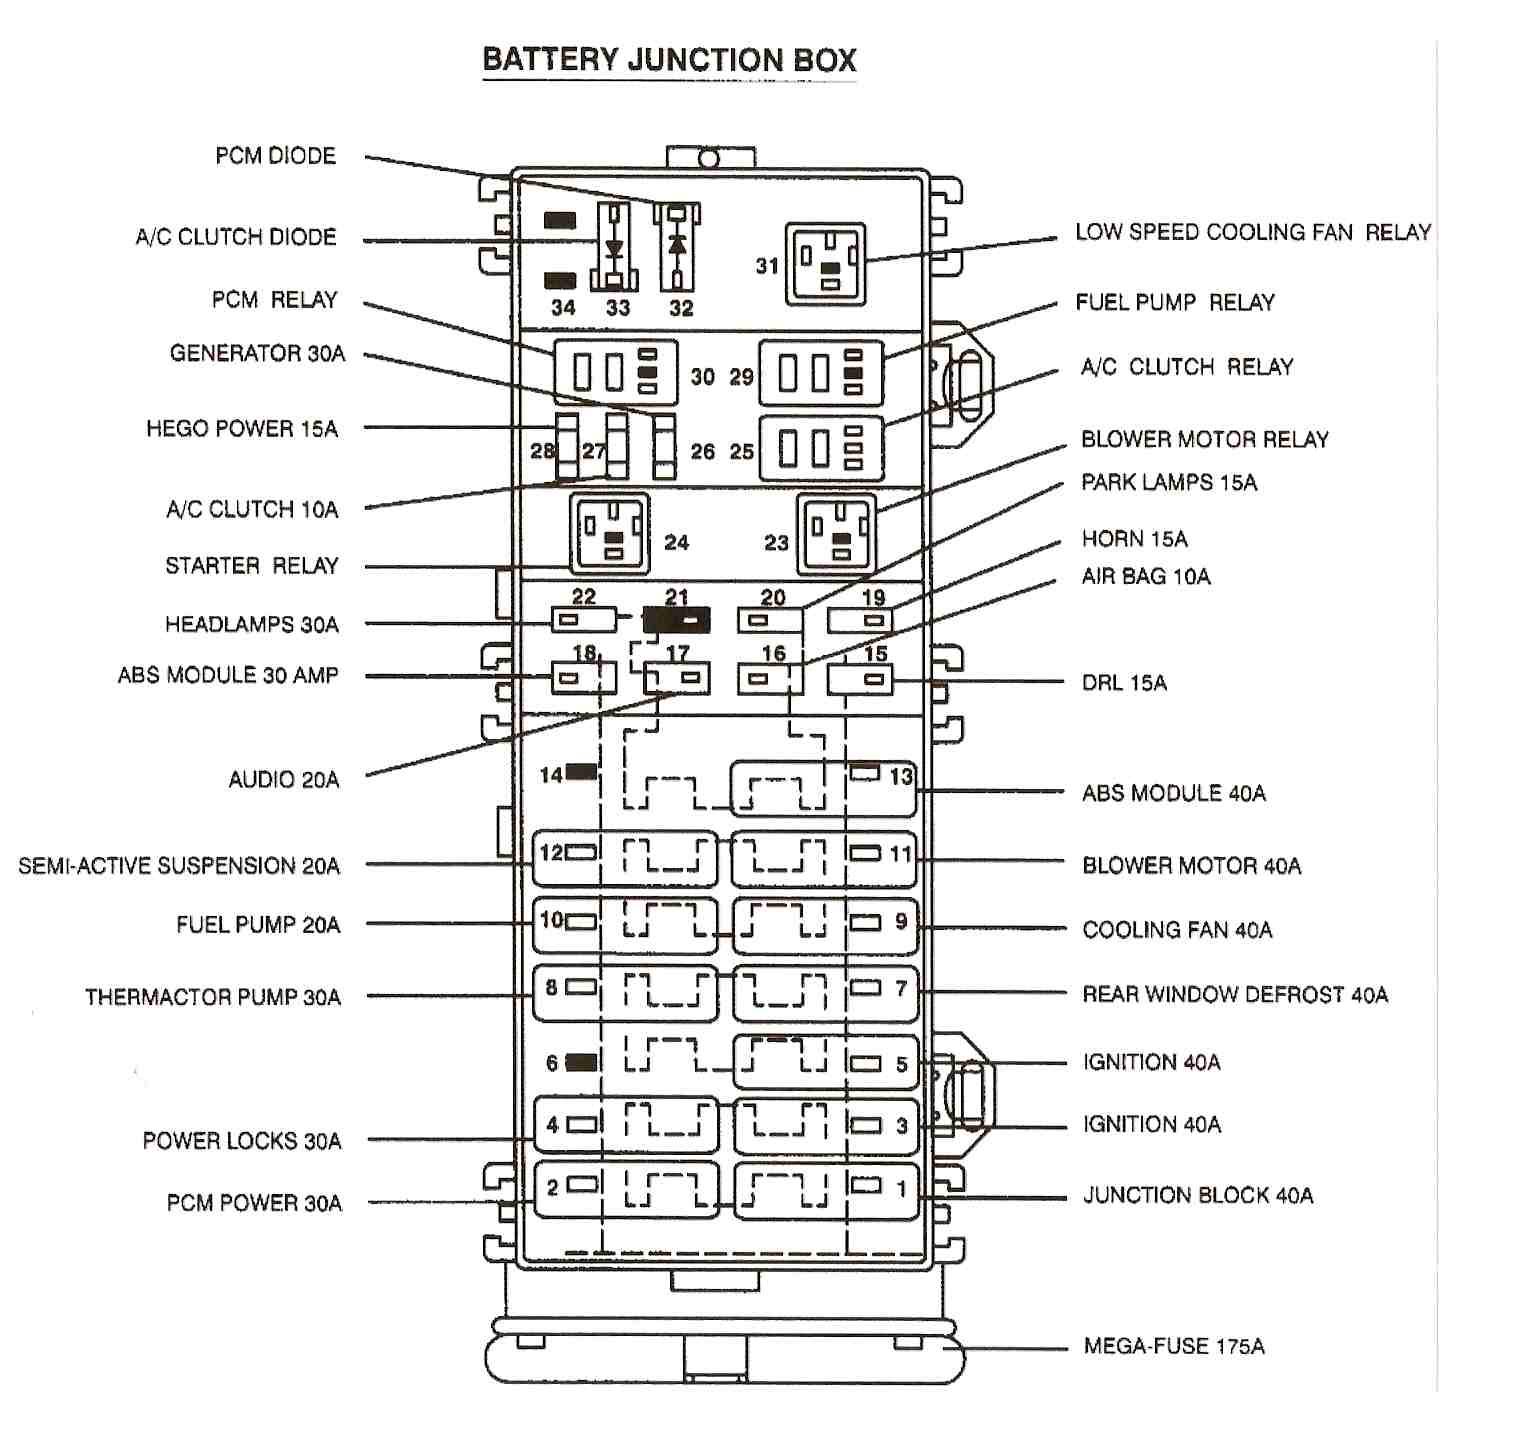 2015 Ford Taurus Fuse Box Diagram 2007 Malibu Radio Wiring Diagram Volvos80 Yenpancane Jeanjaures37 Fr